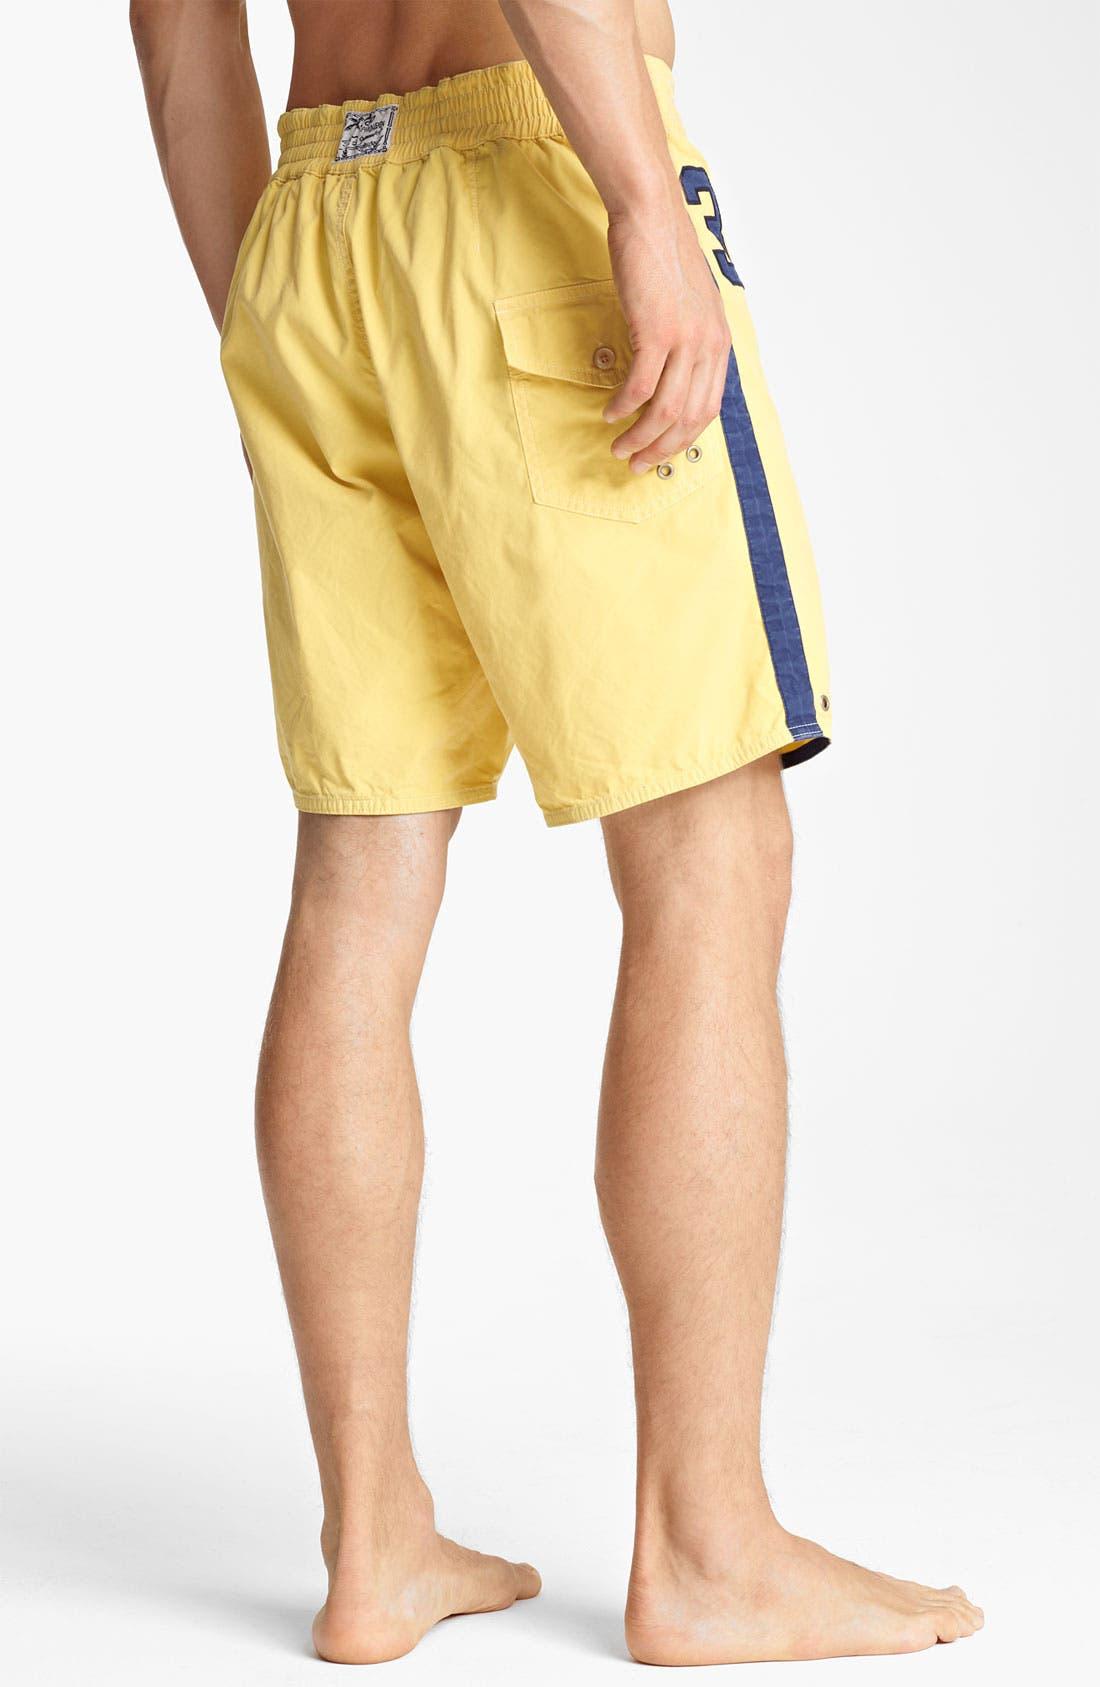 Alternate Image 2  - Polo Ralph Lauren 'Sanibel' Swim Trunks